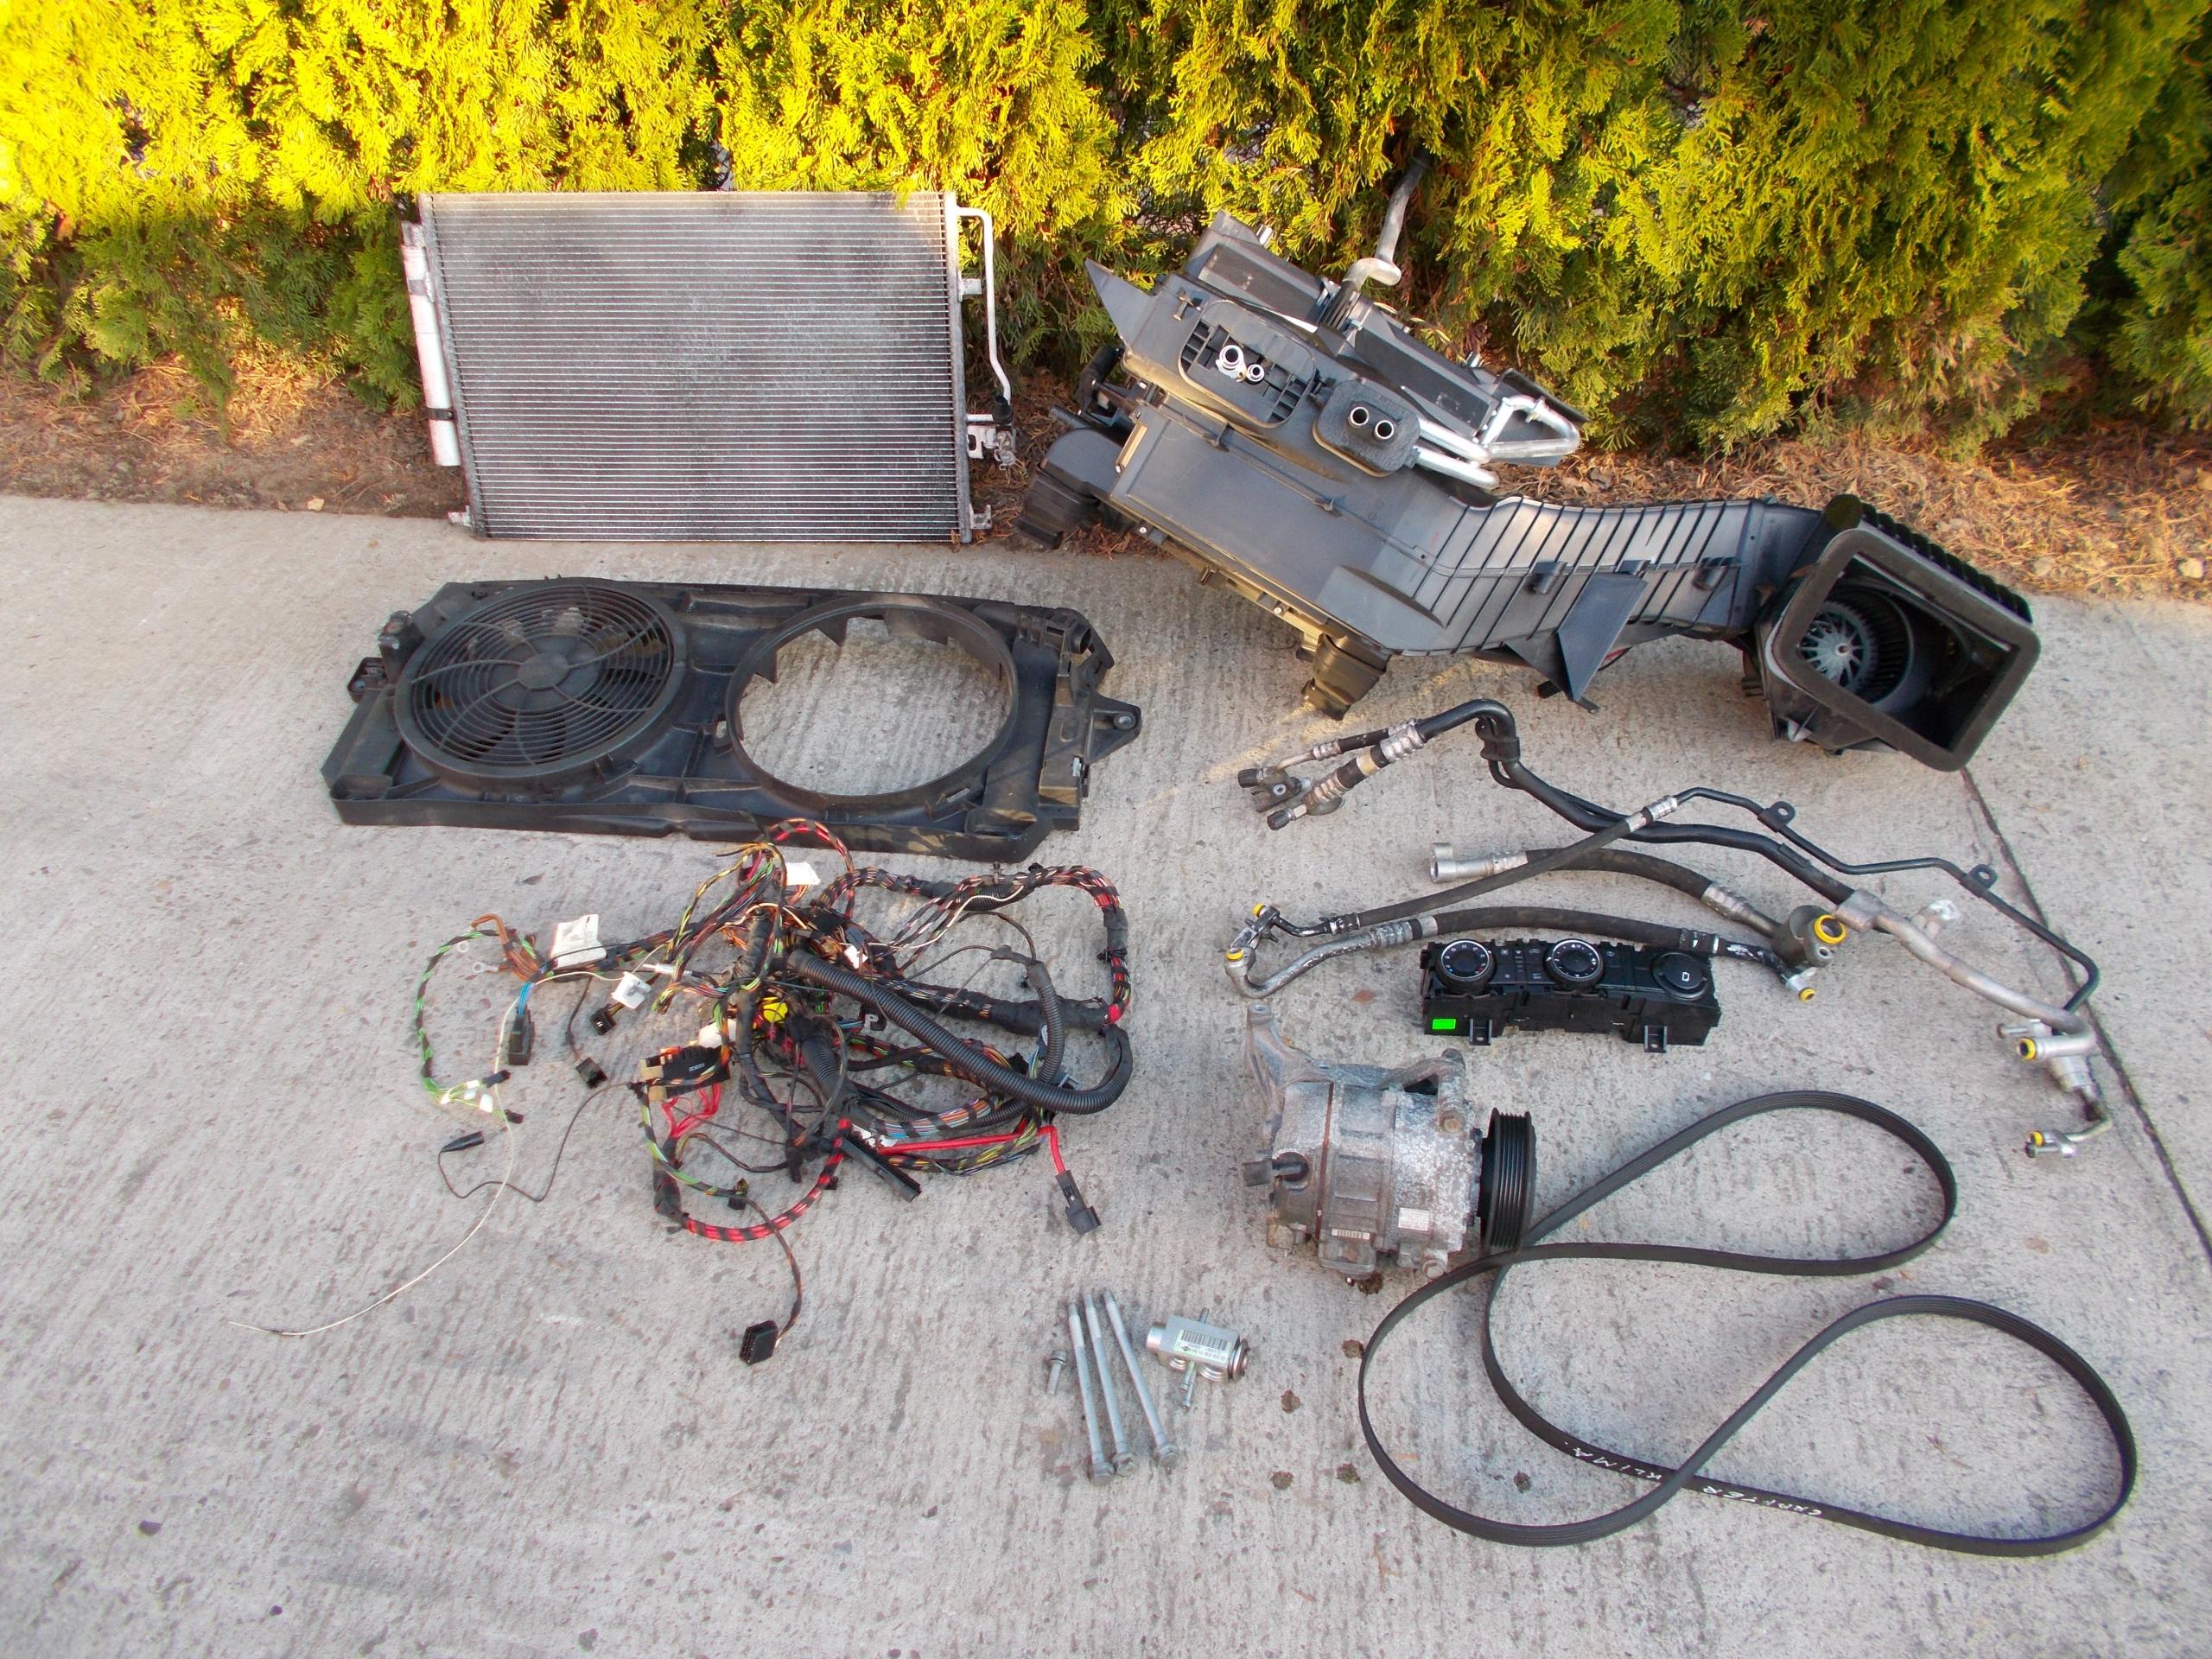 mercedes sprinter 906 30 v6 кондиционер комплект